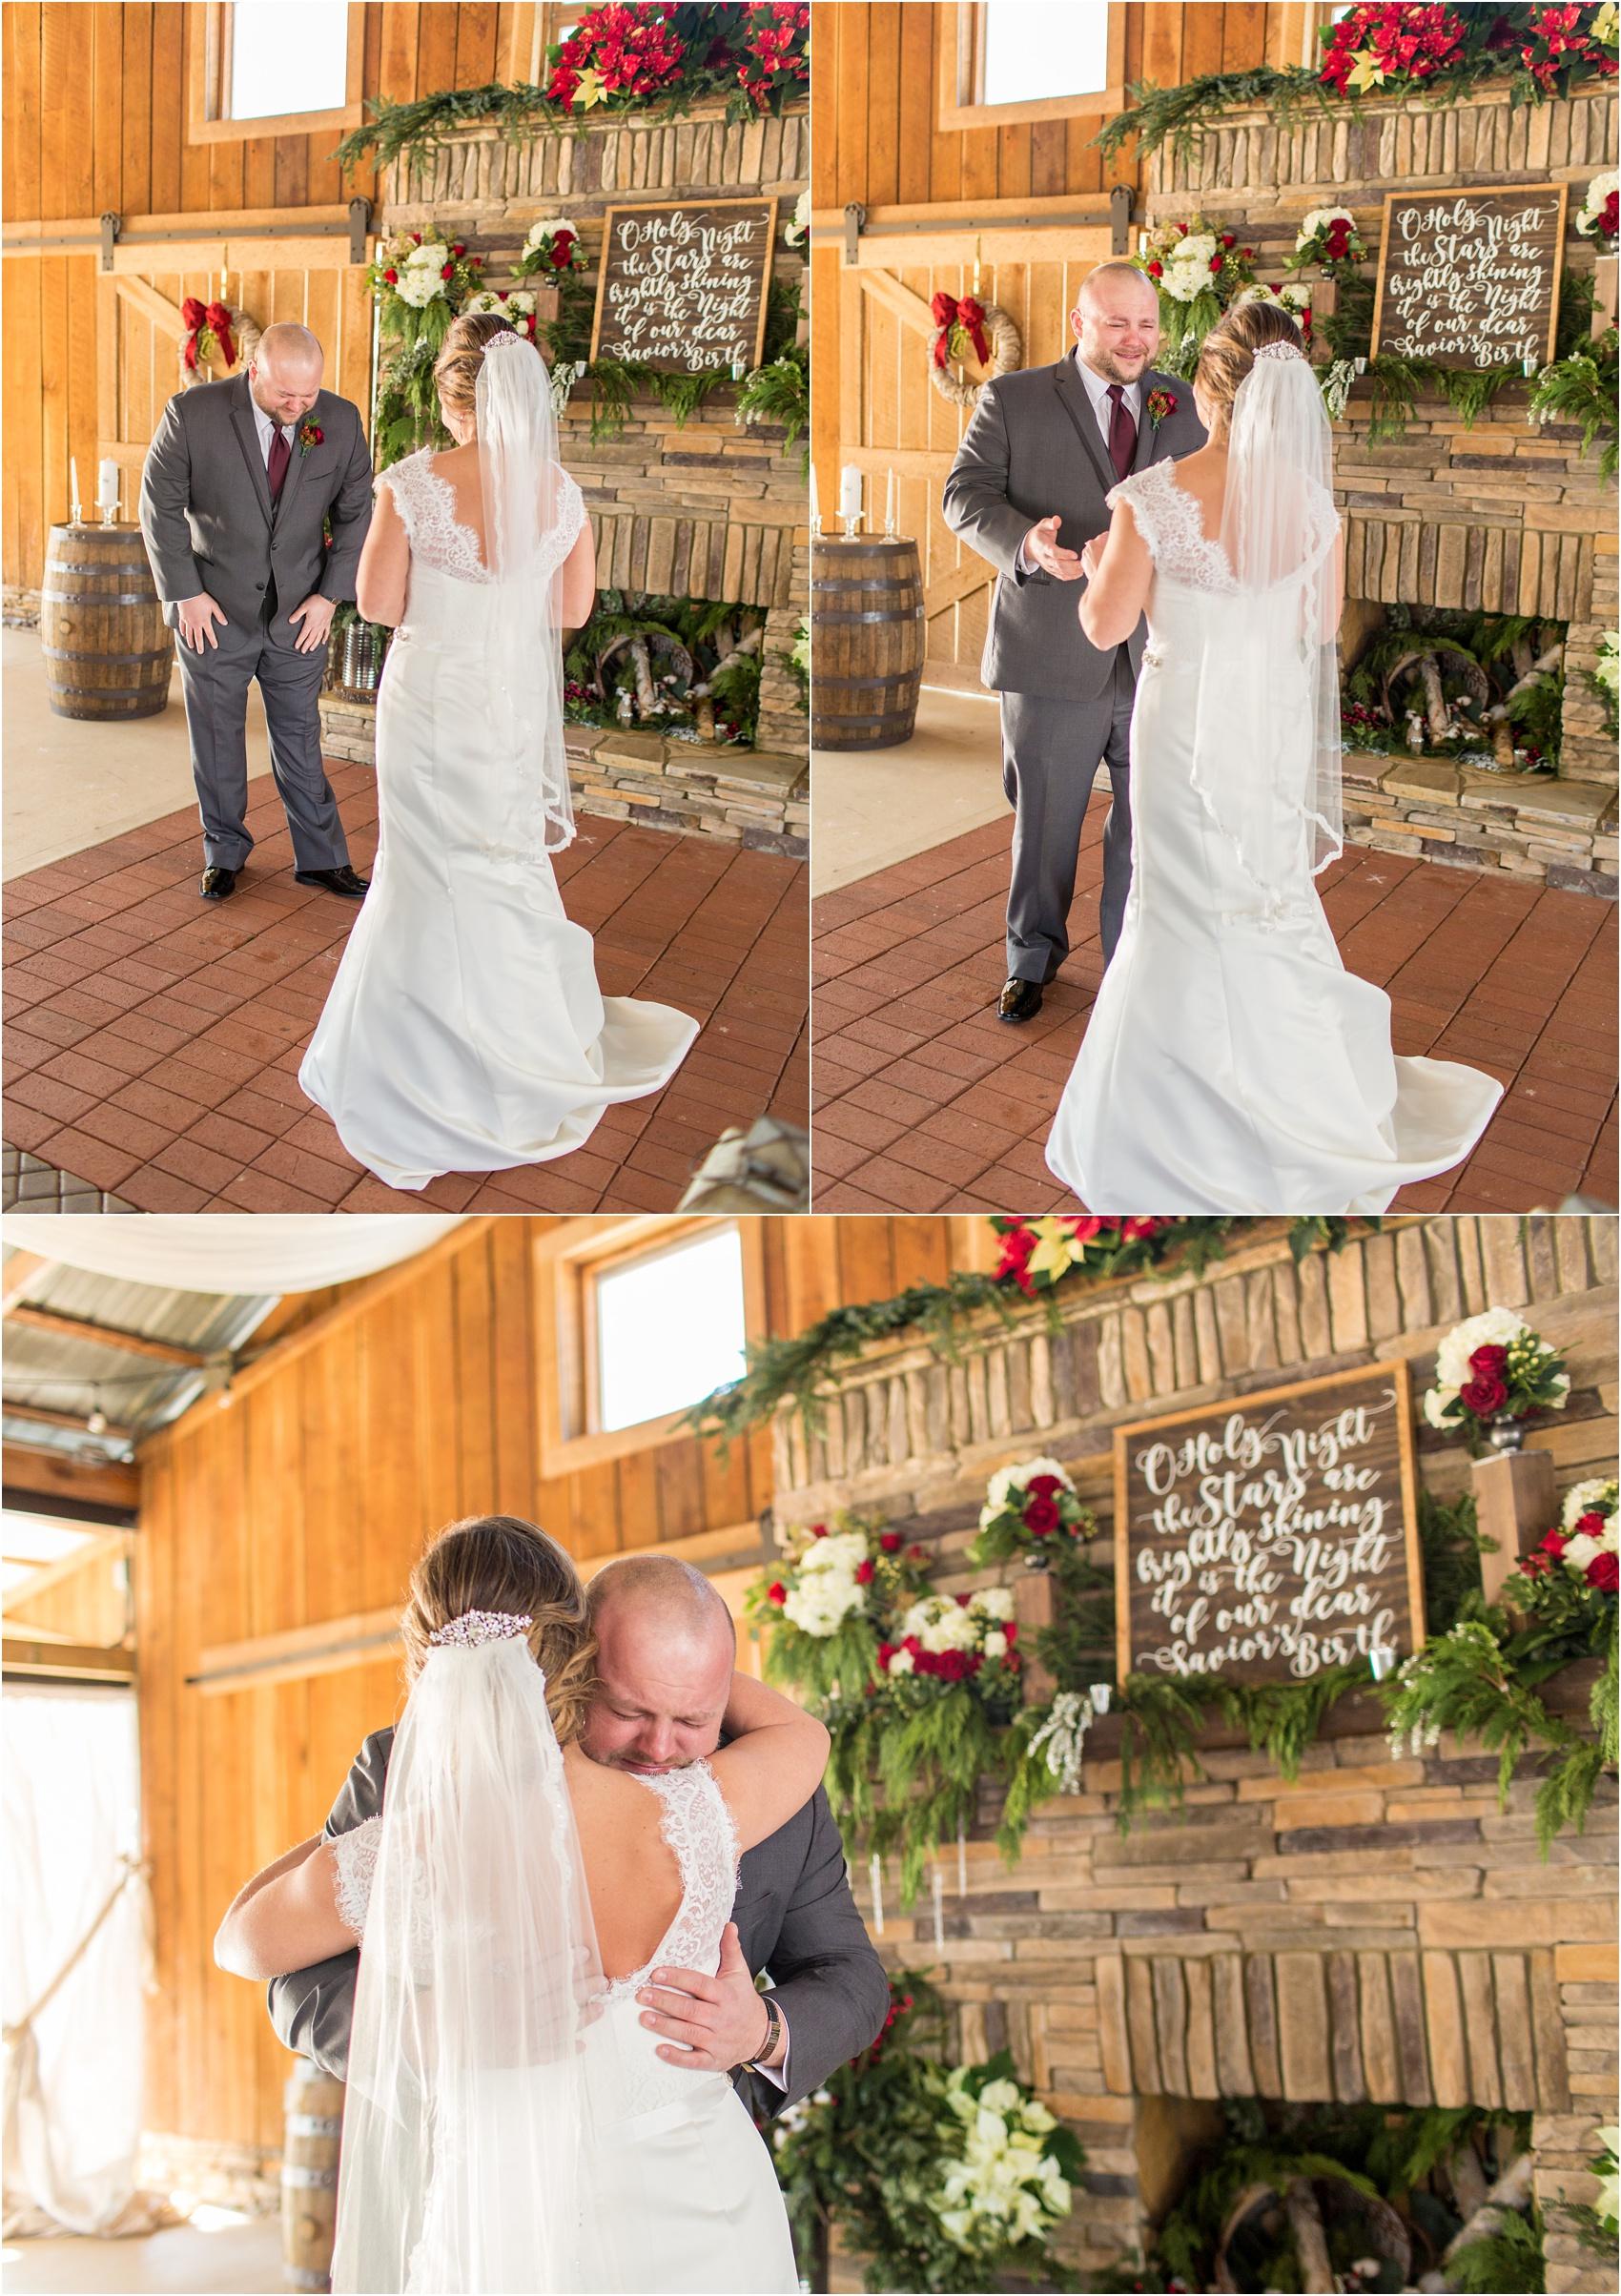 Savannah Eve Photography- Page Wedding Blog-29.jpg